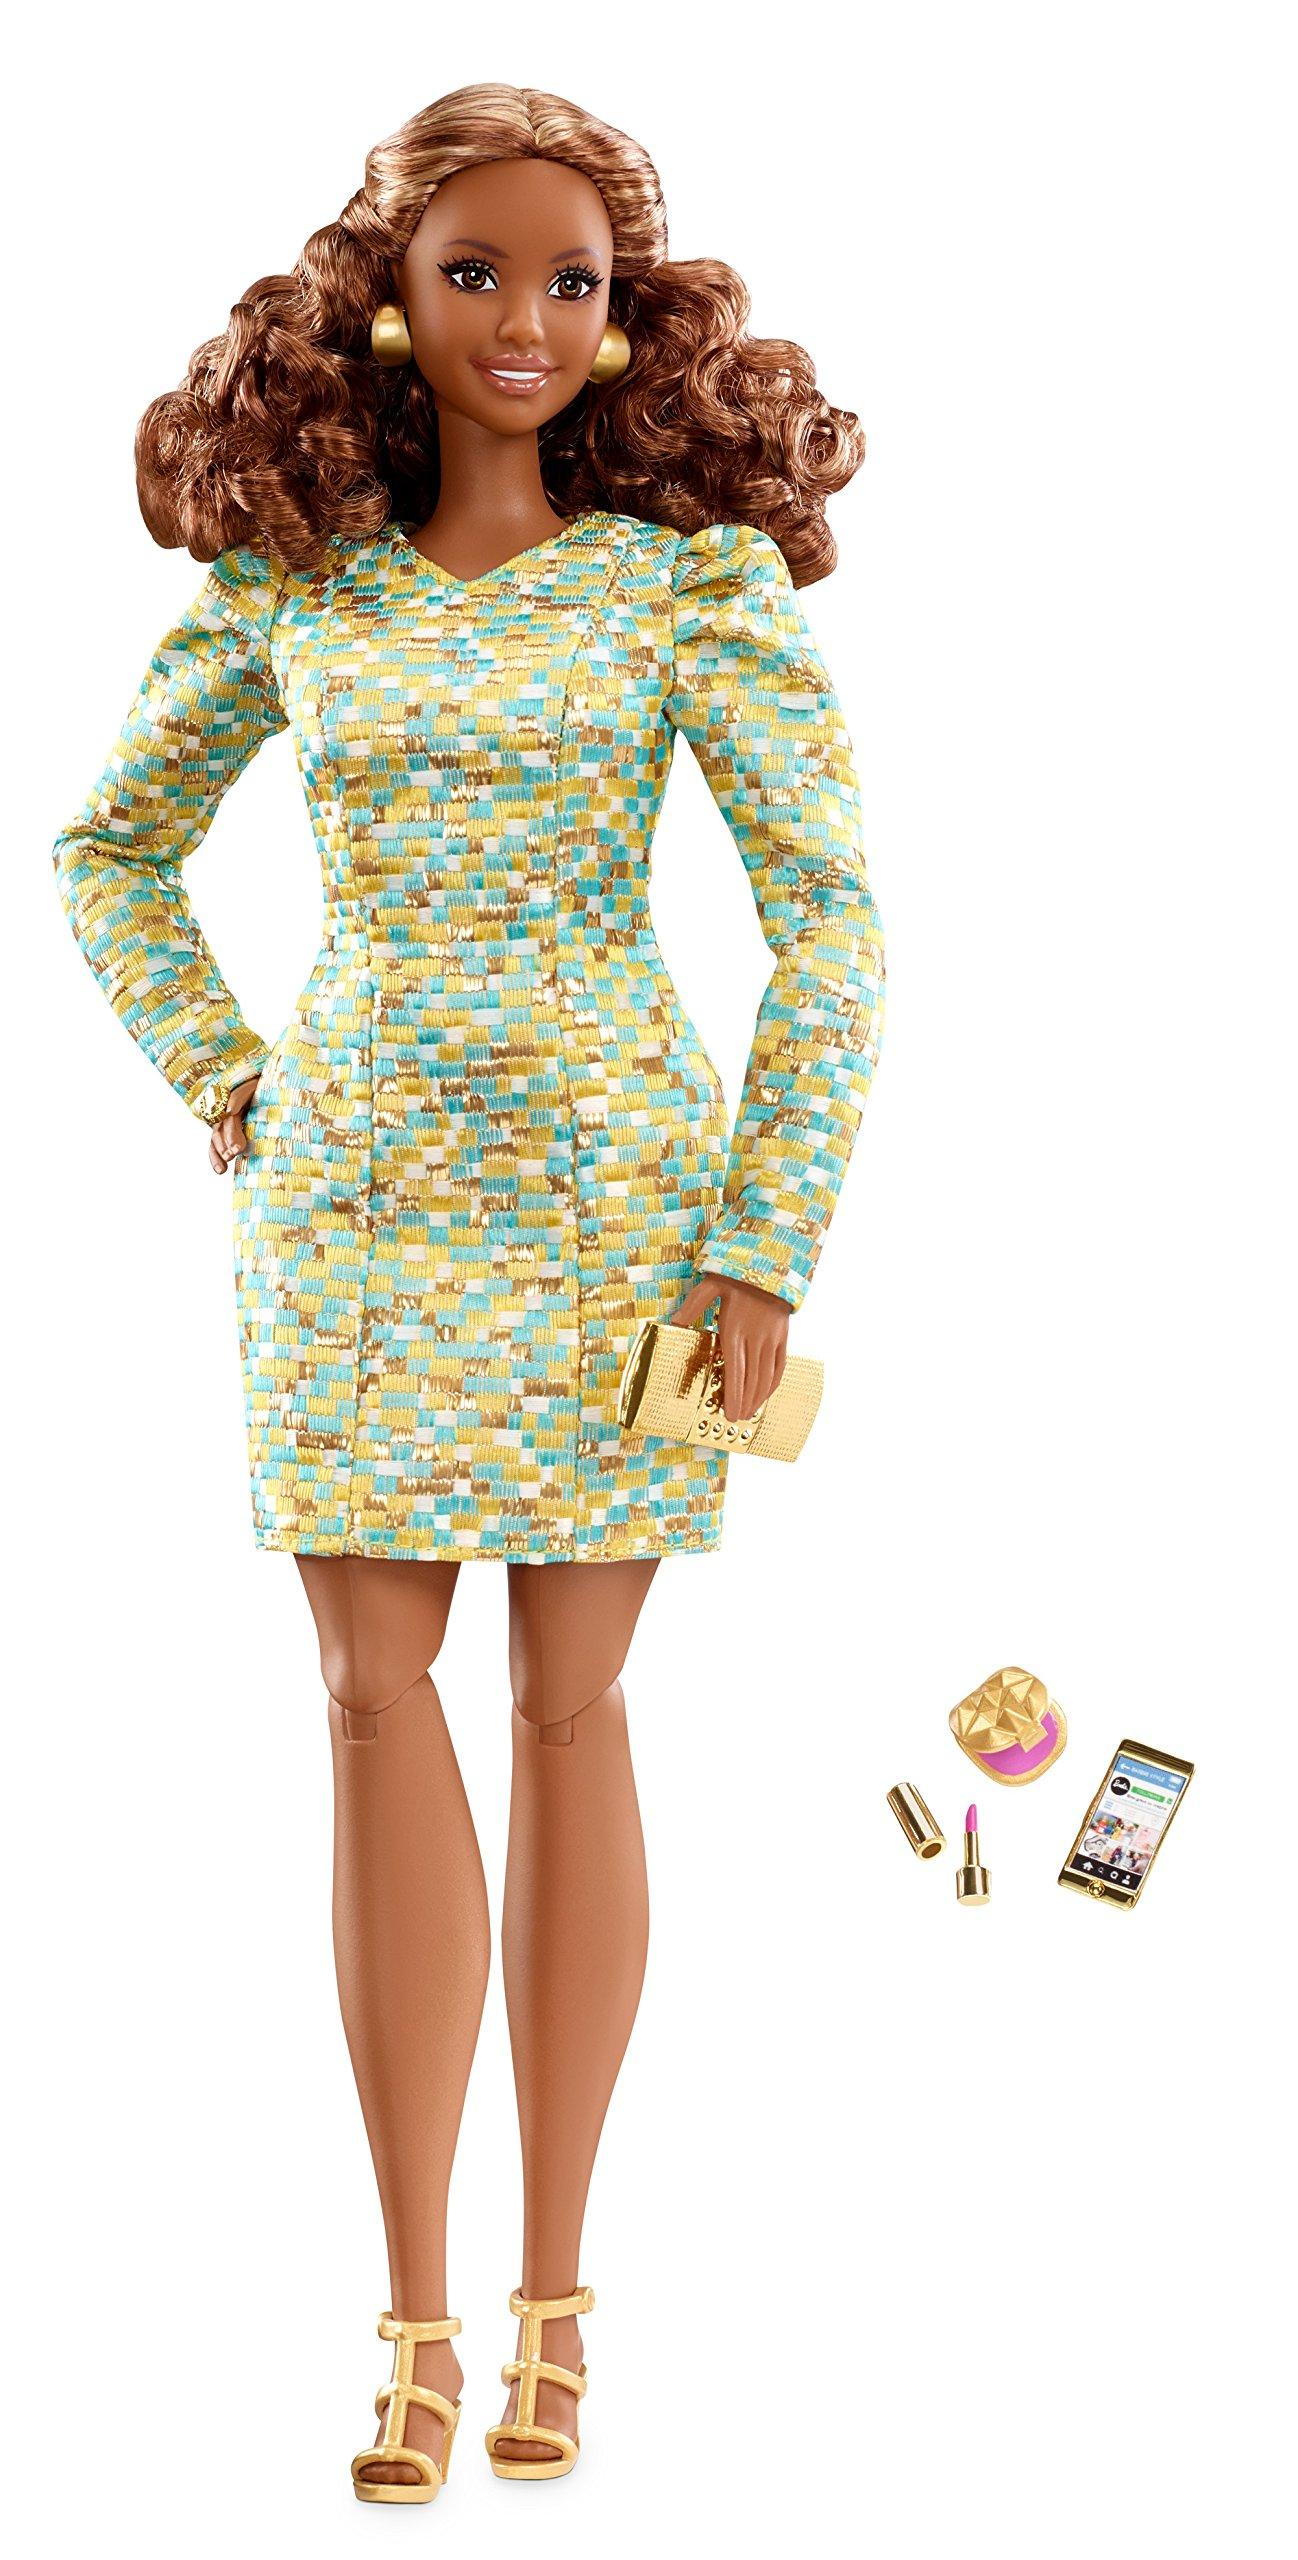 Barbie The Look Doll, Metallic Mini